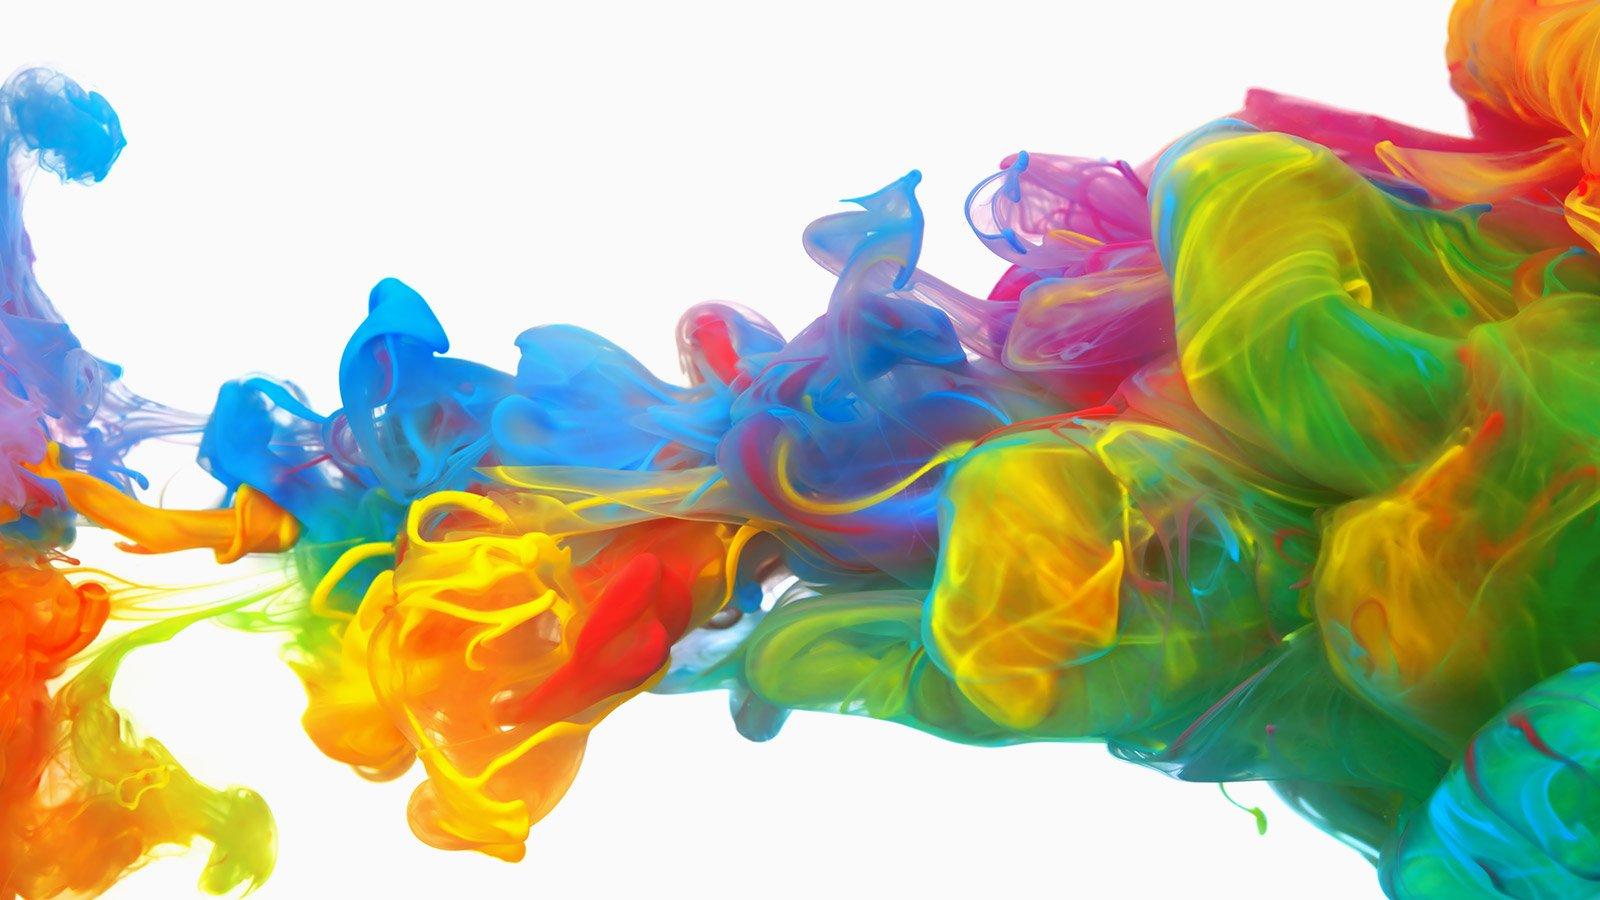 Colors mixing